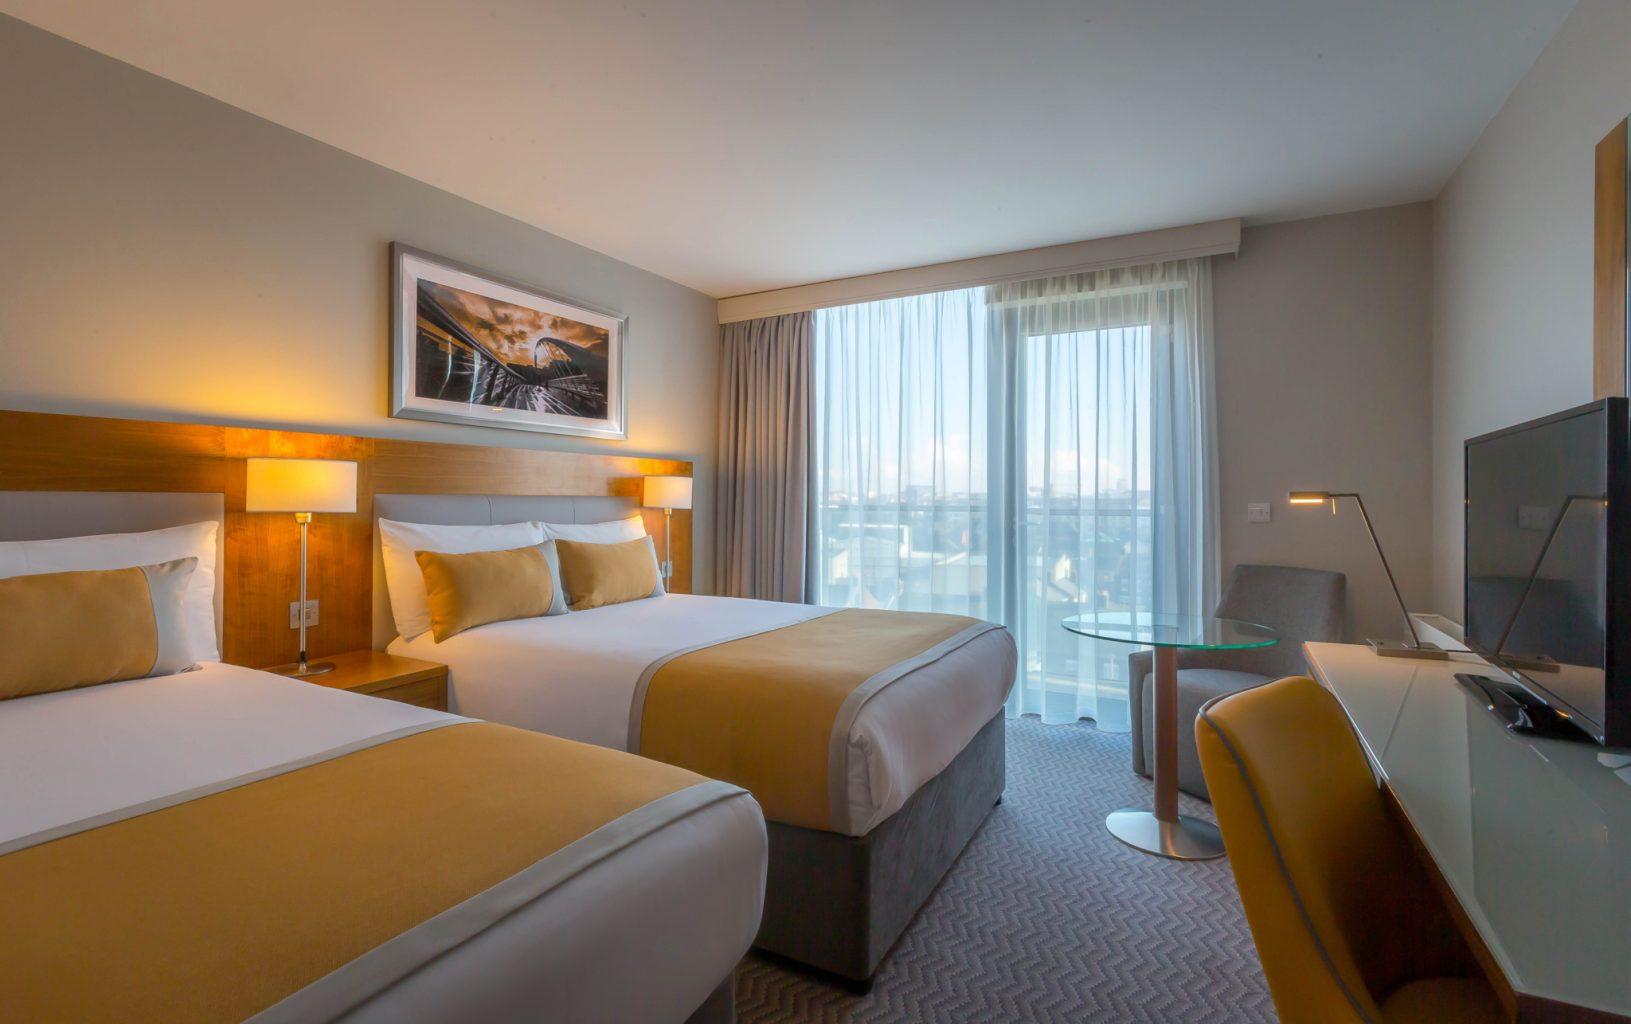 Triple Room at Maldron Hotel Smithfield